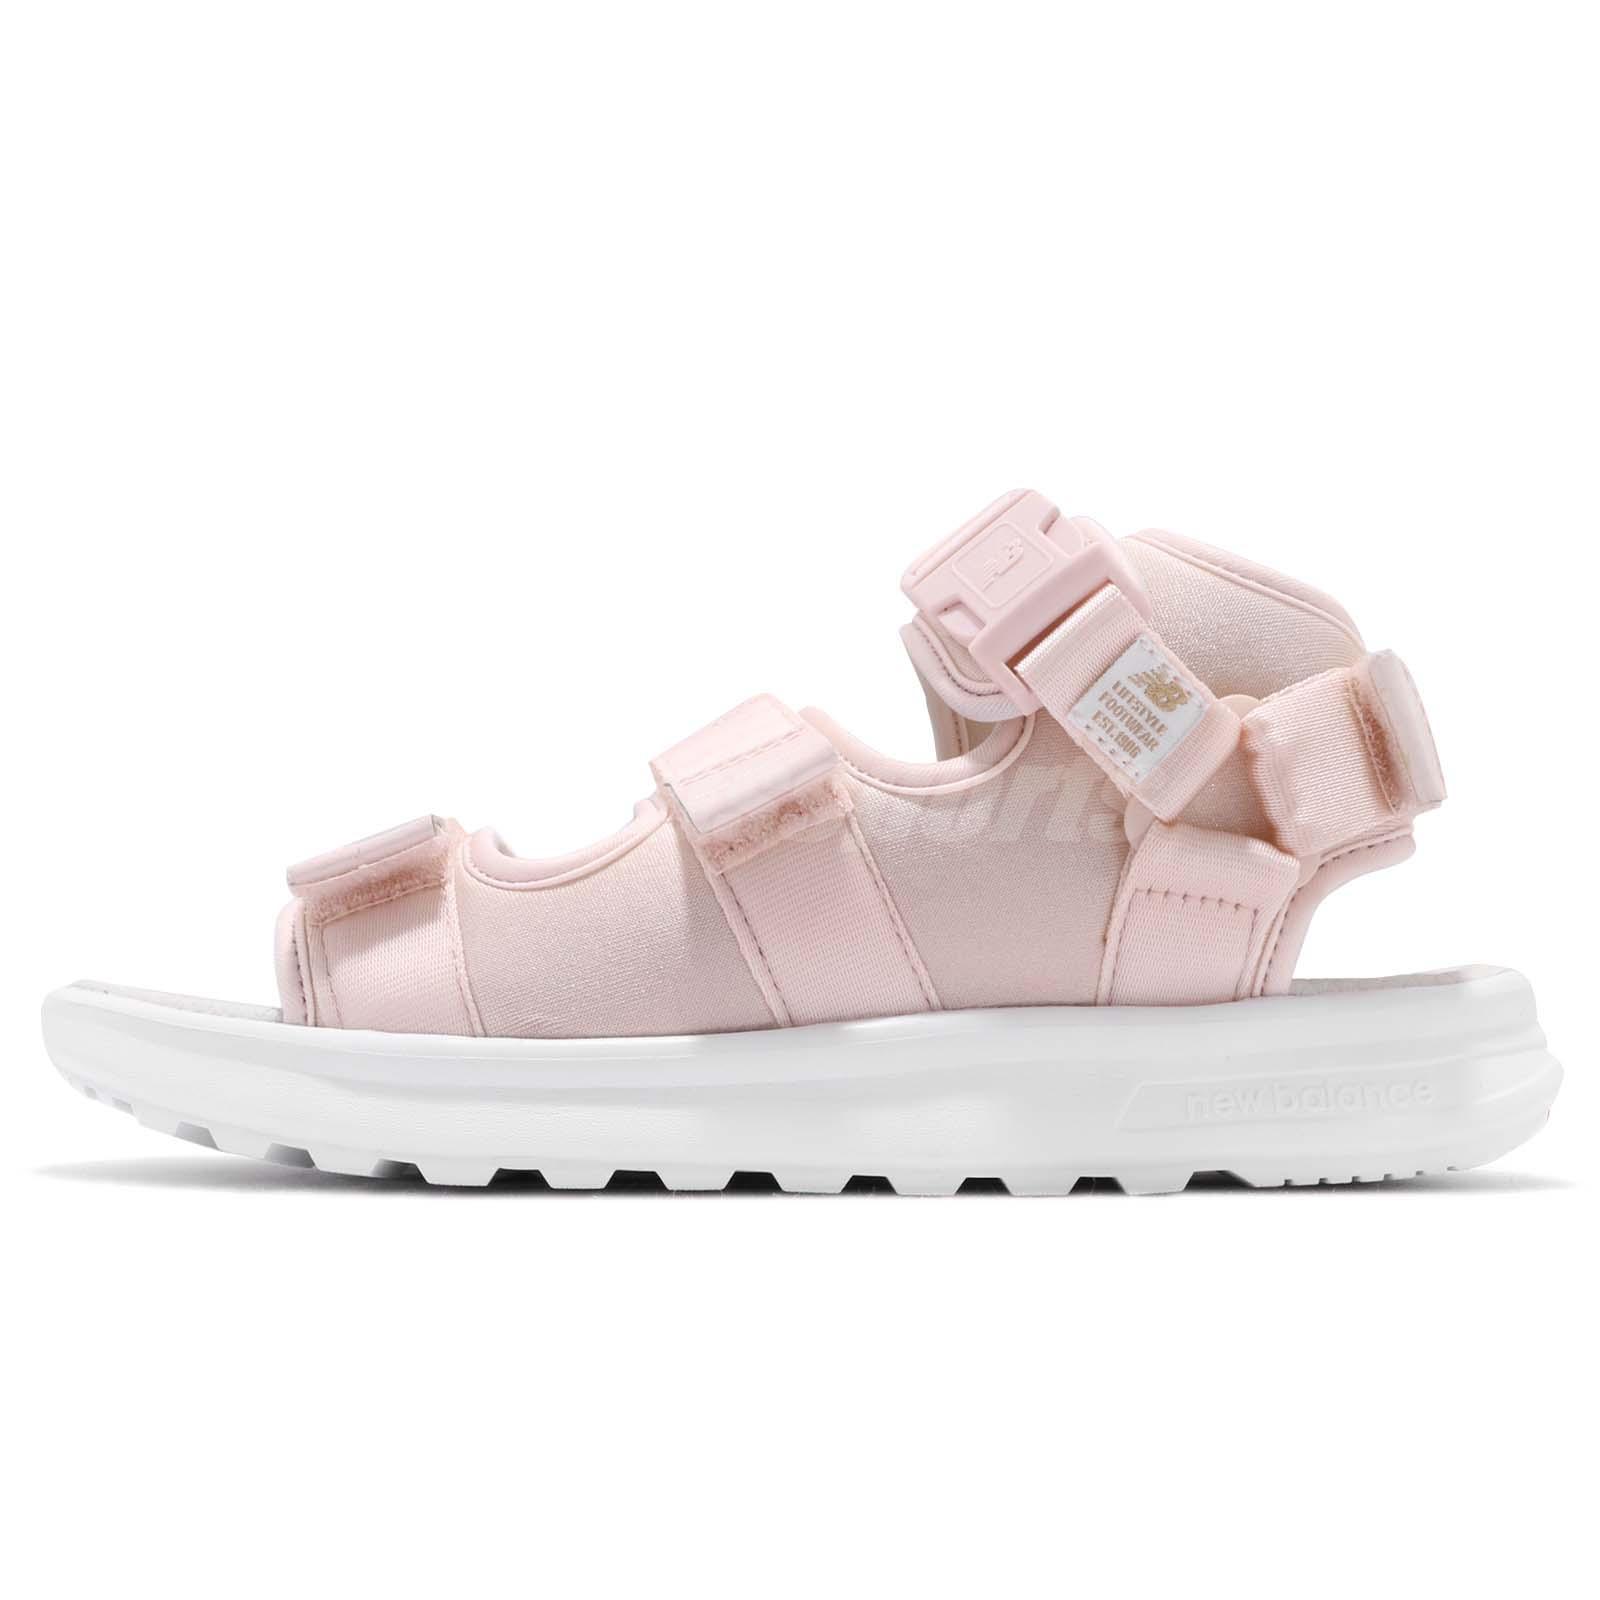 77cbfa90abc New Balance SD750PP D Pink White Men Women One Click Sandal Shoes SD750PPD